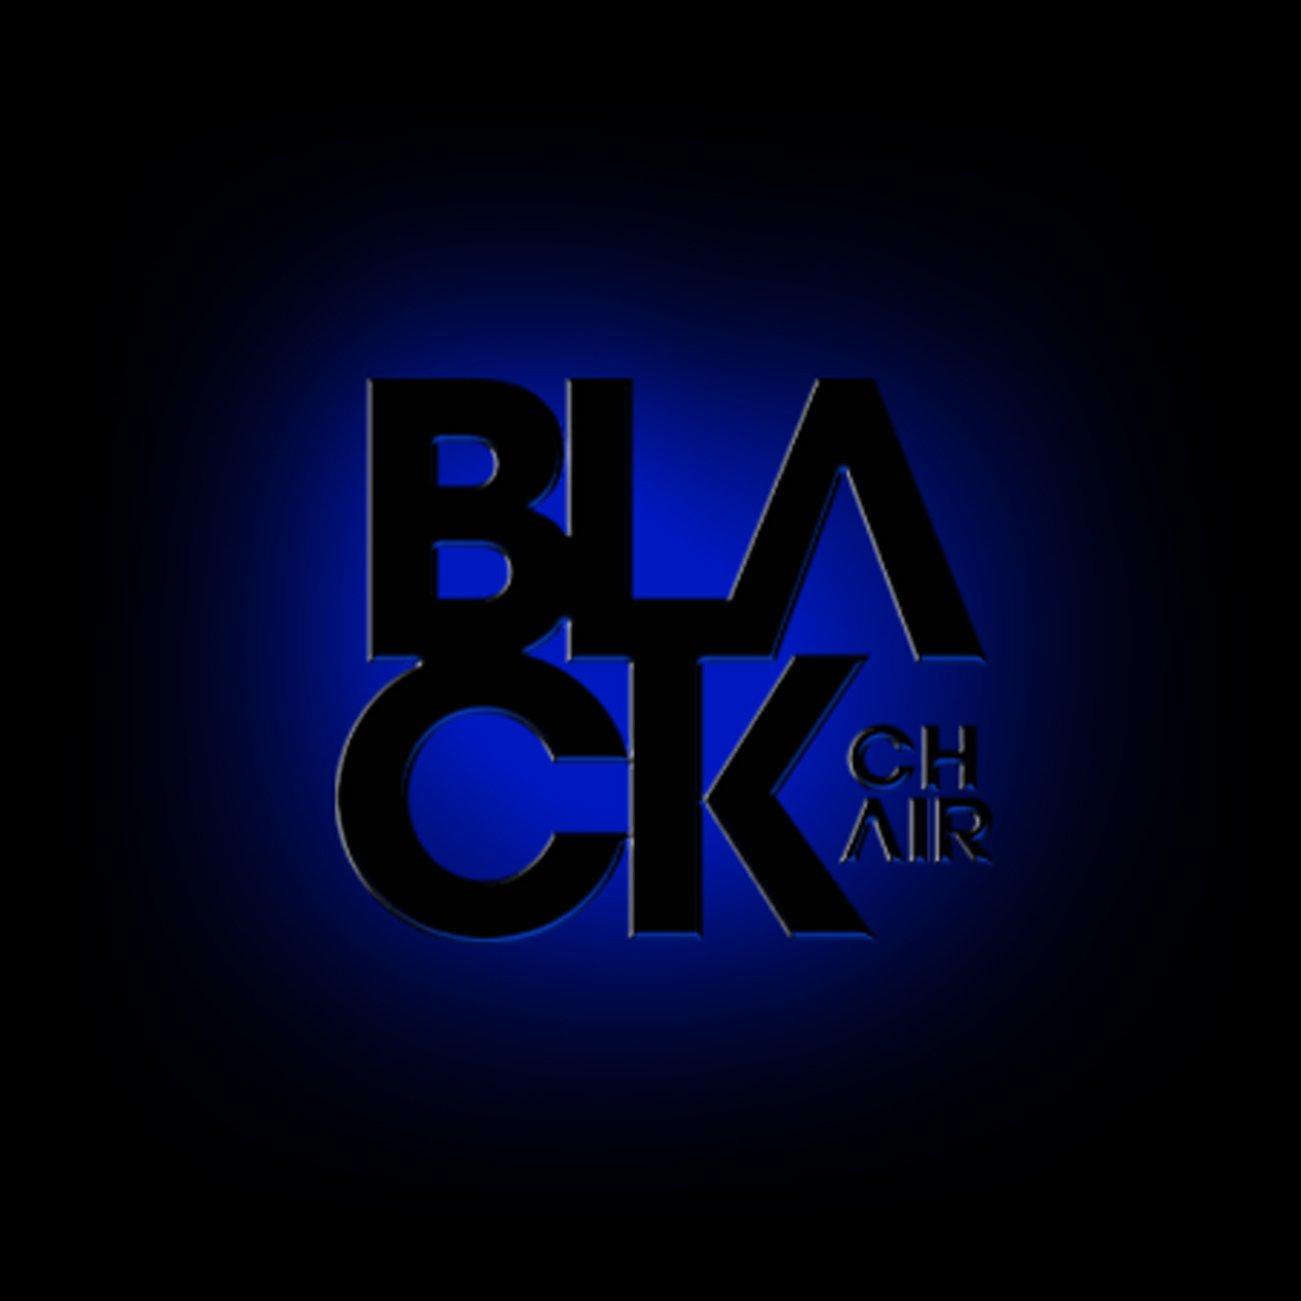 SEDIA BLACK CHAIR